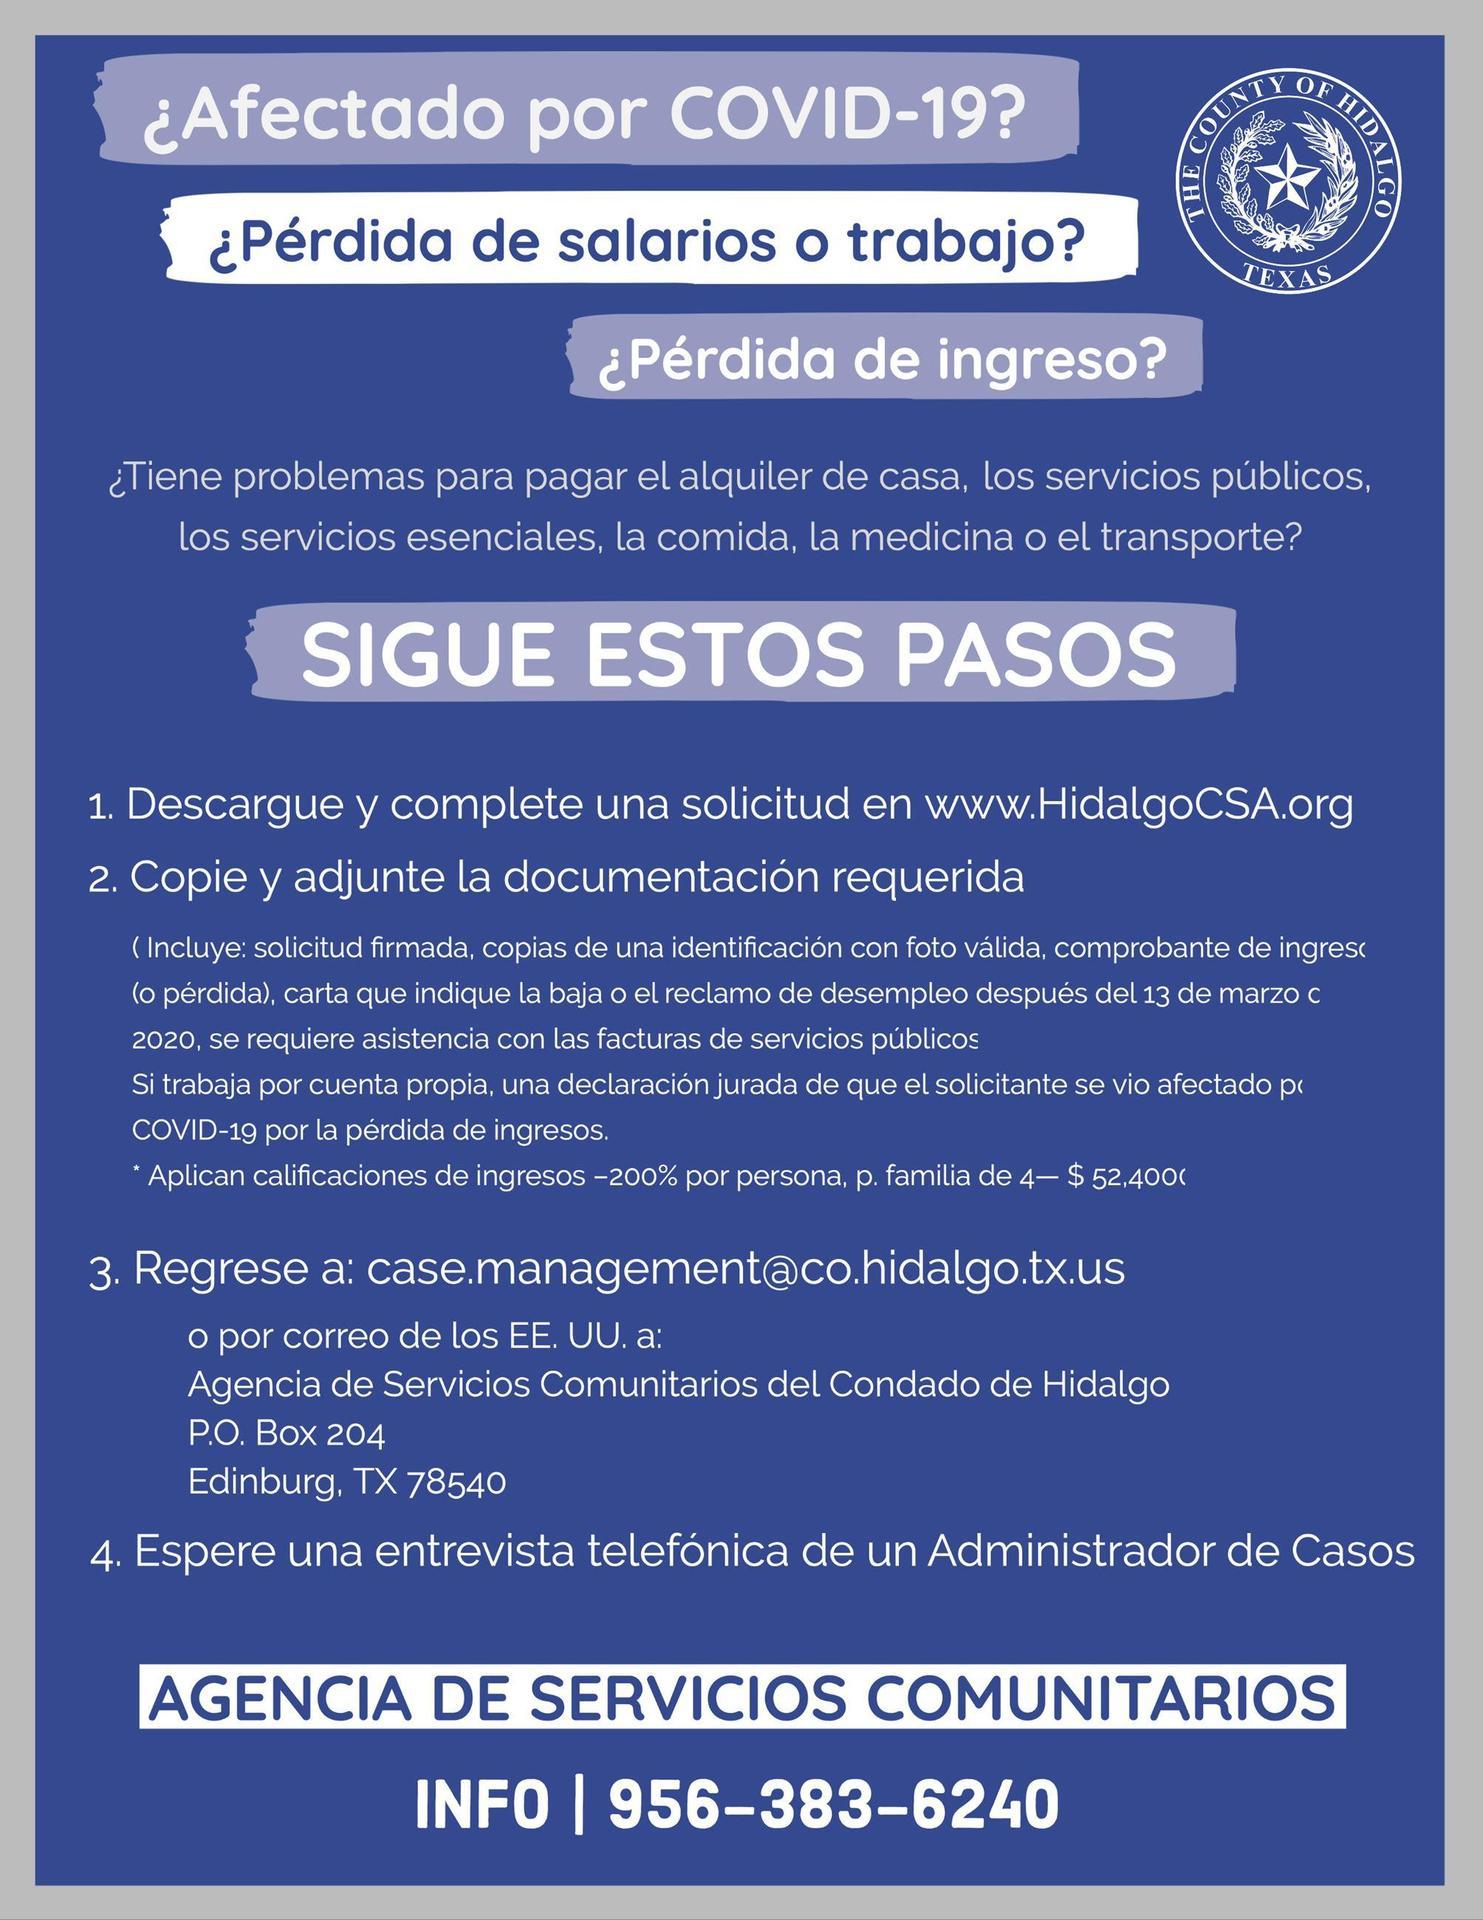 Hidalgo County Spanish